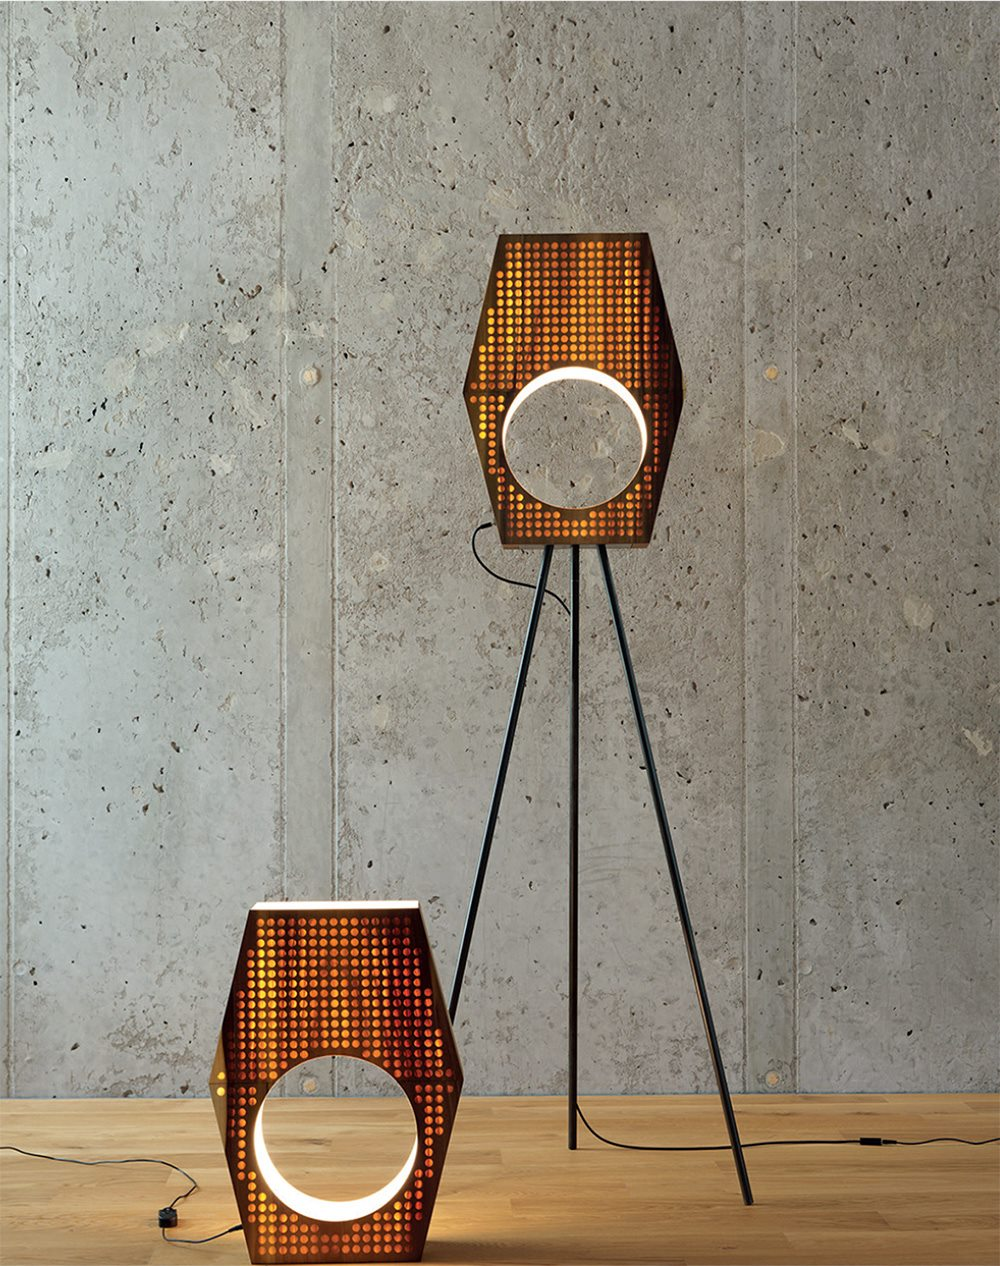 13&9 design - Wood Light (foto Paul Ott)